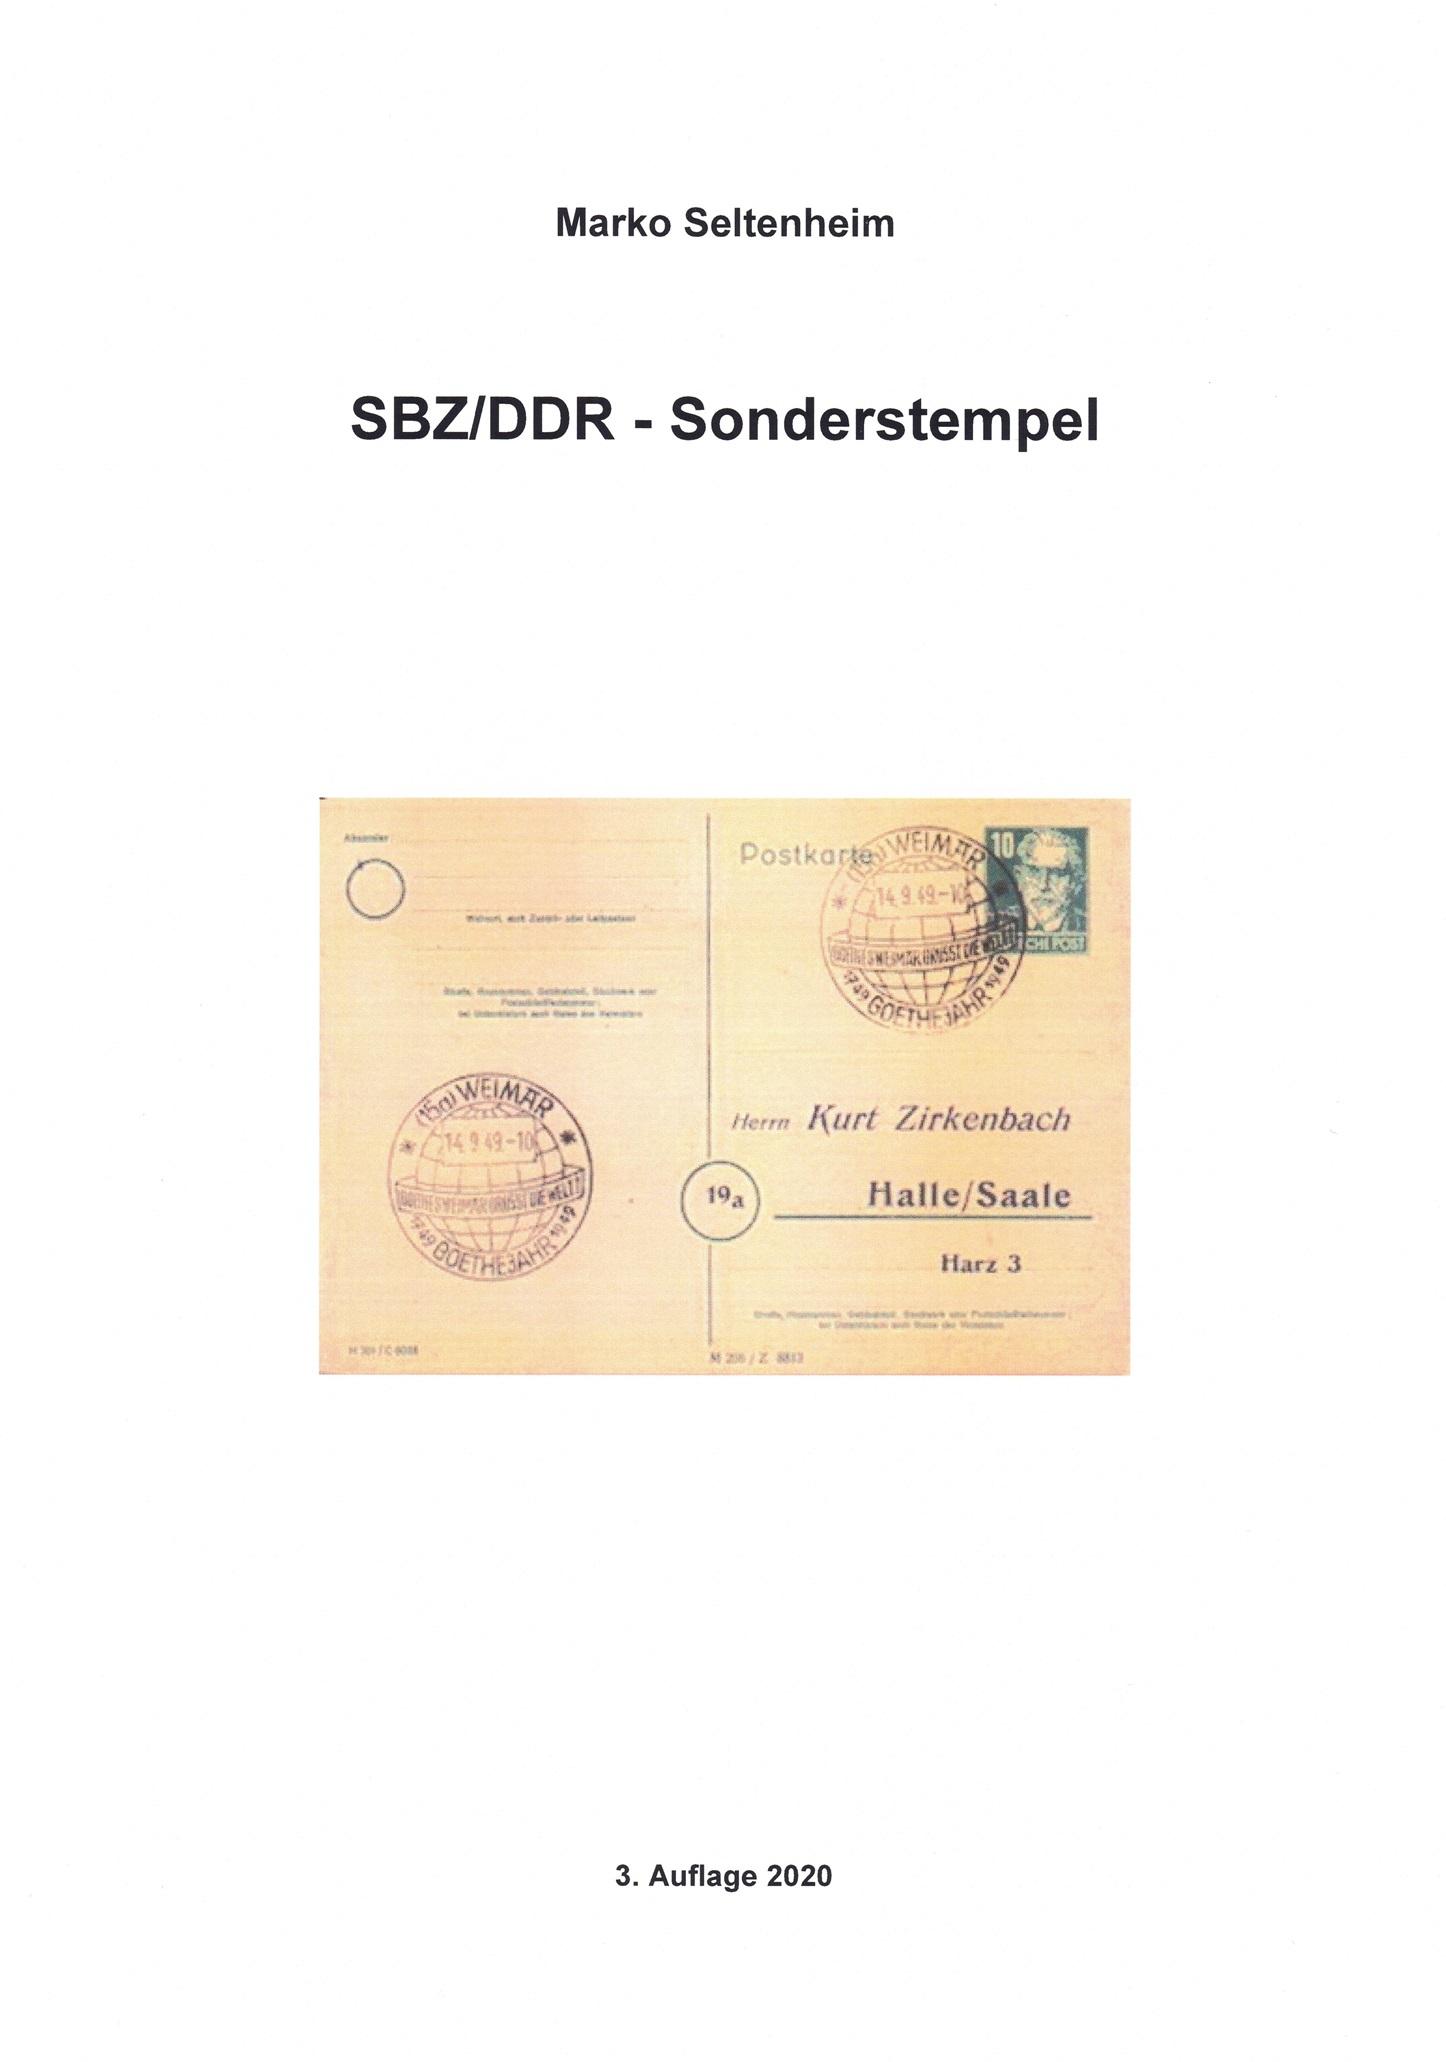 DDR SBZ Philatelie Stempel Sonderstempel